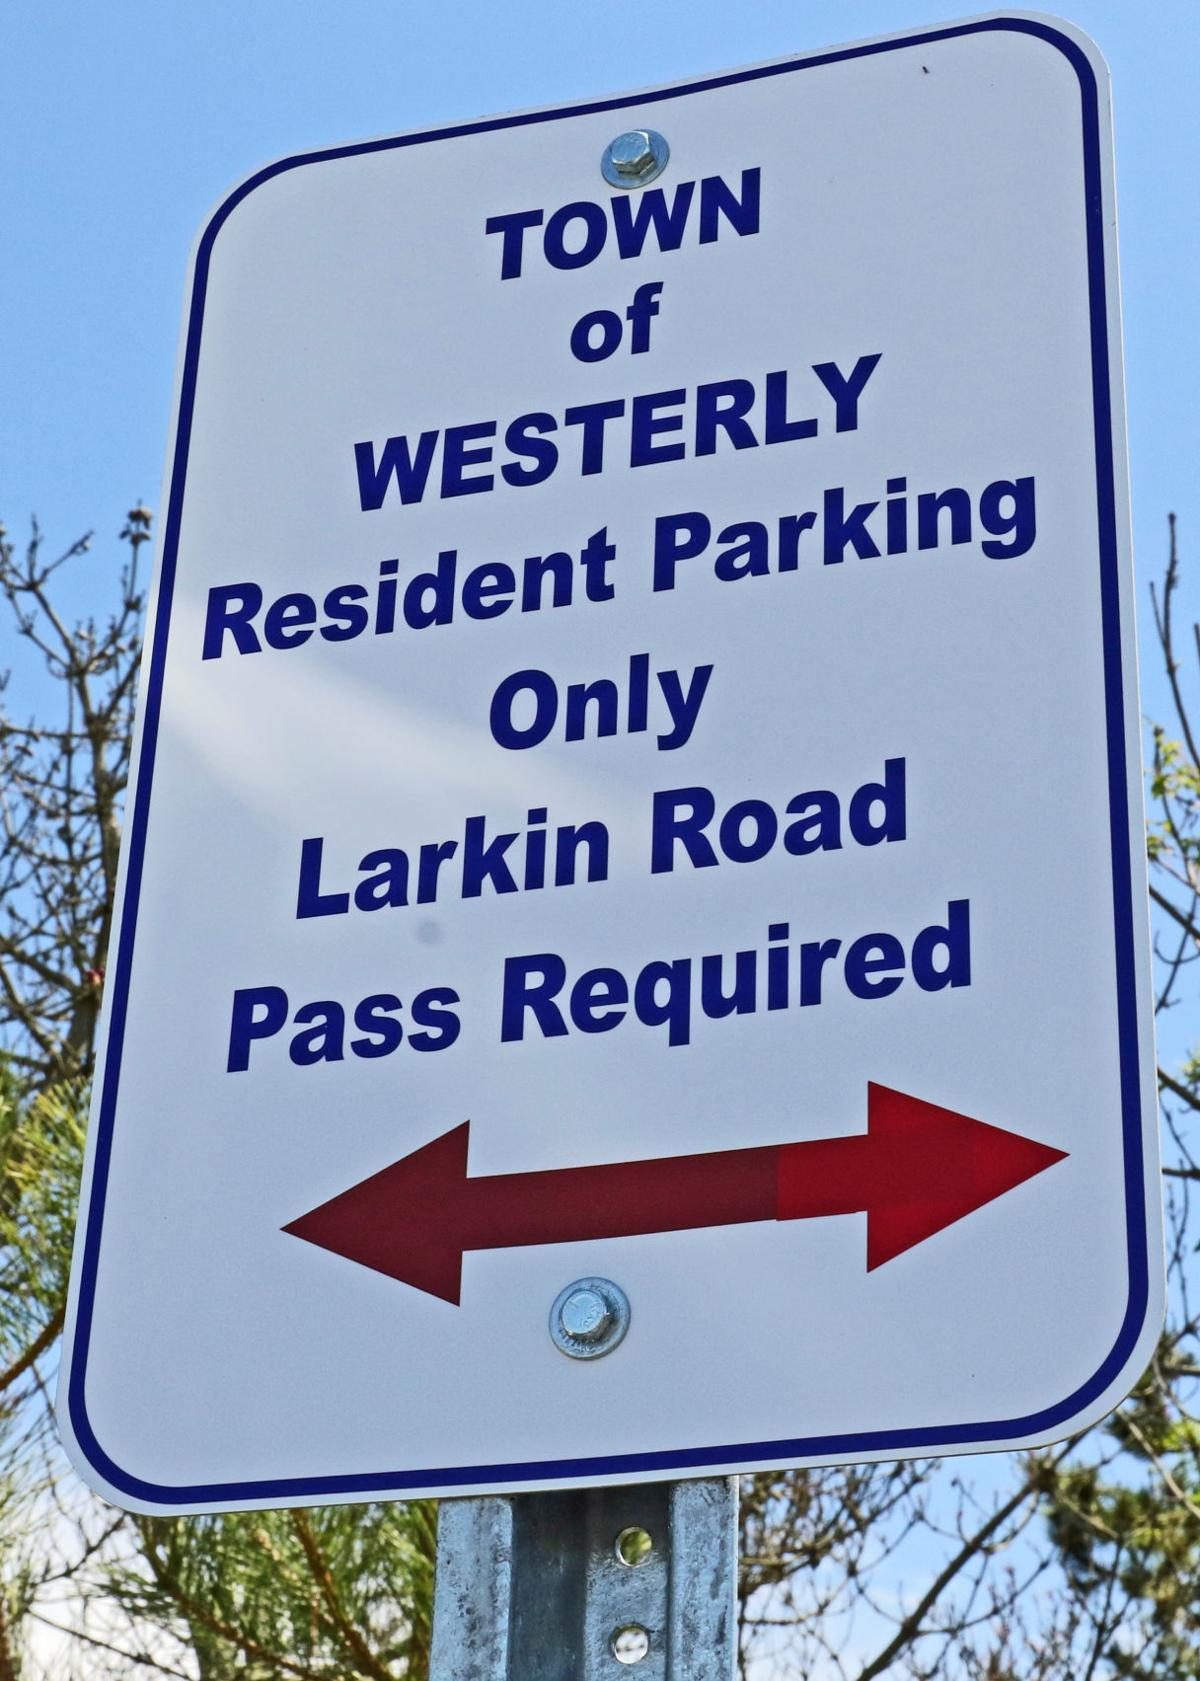 WES Spray Rock parking signs-WS-061220 21695.JPG